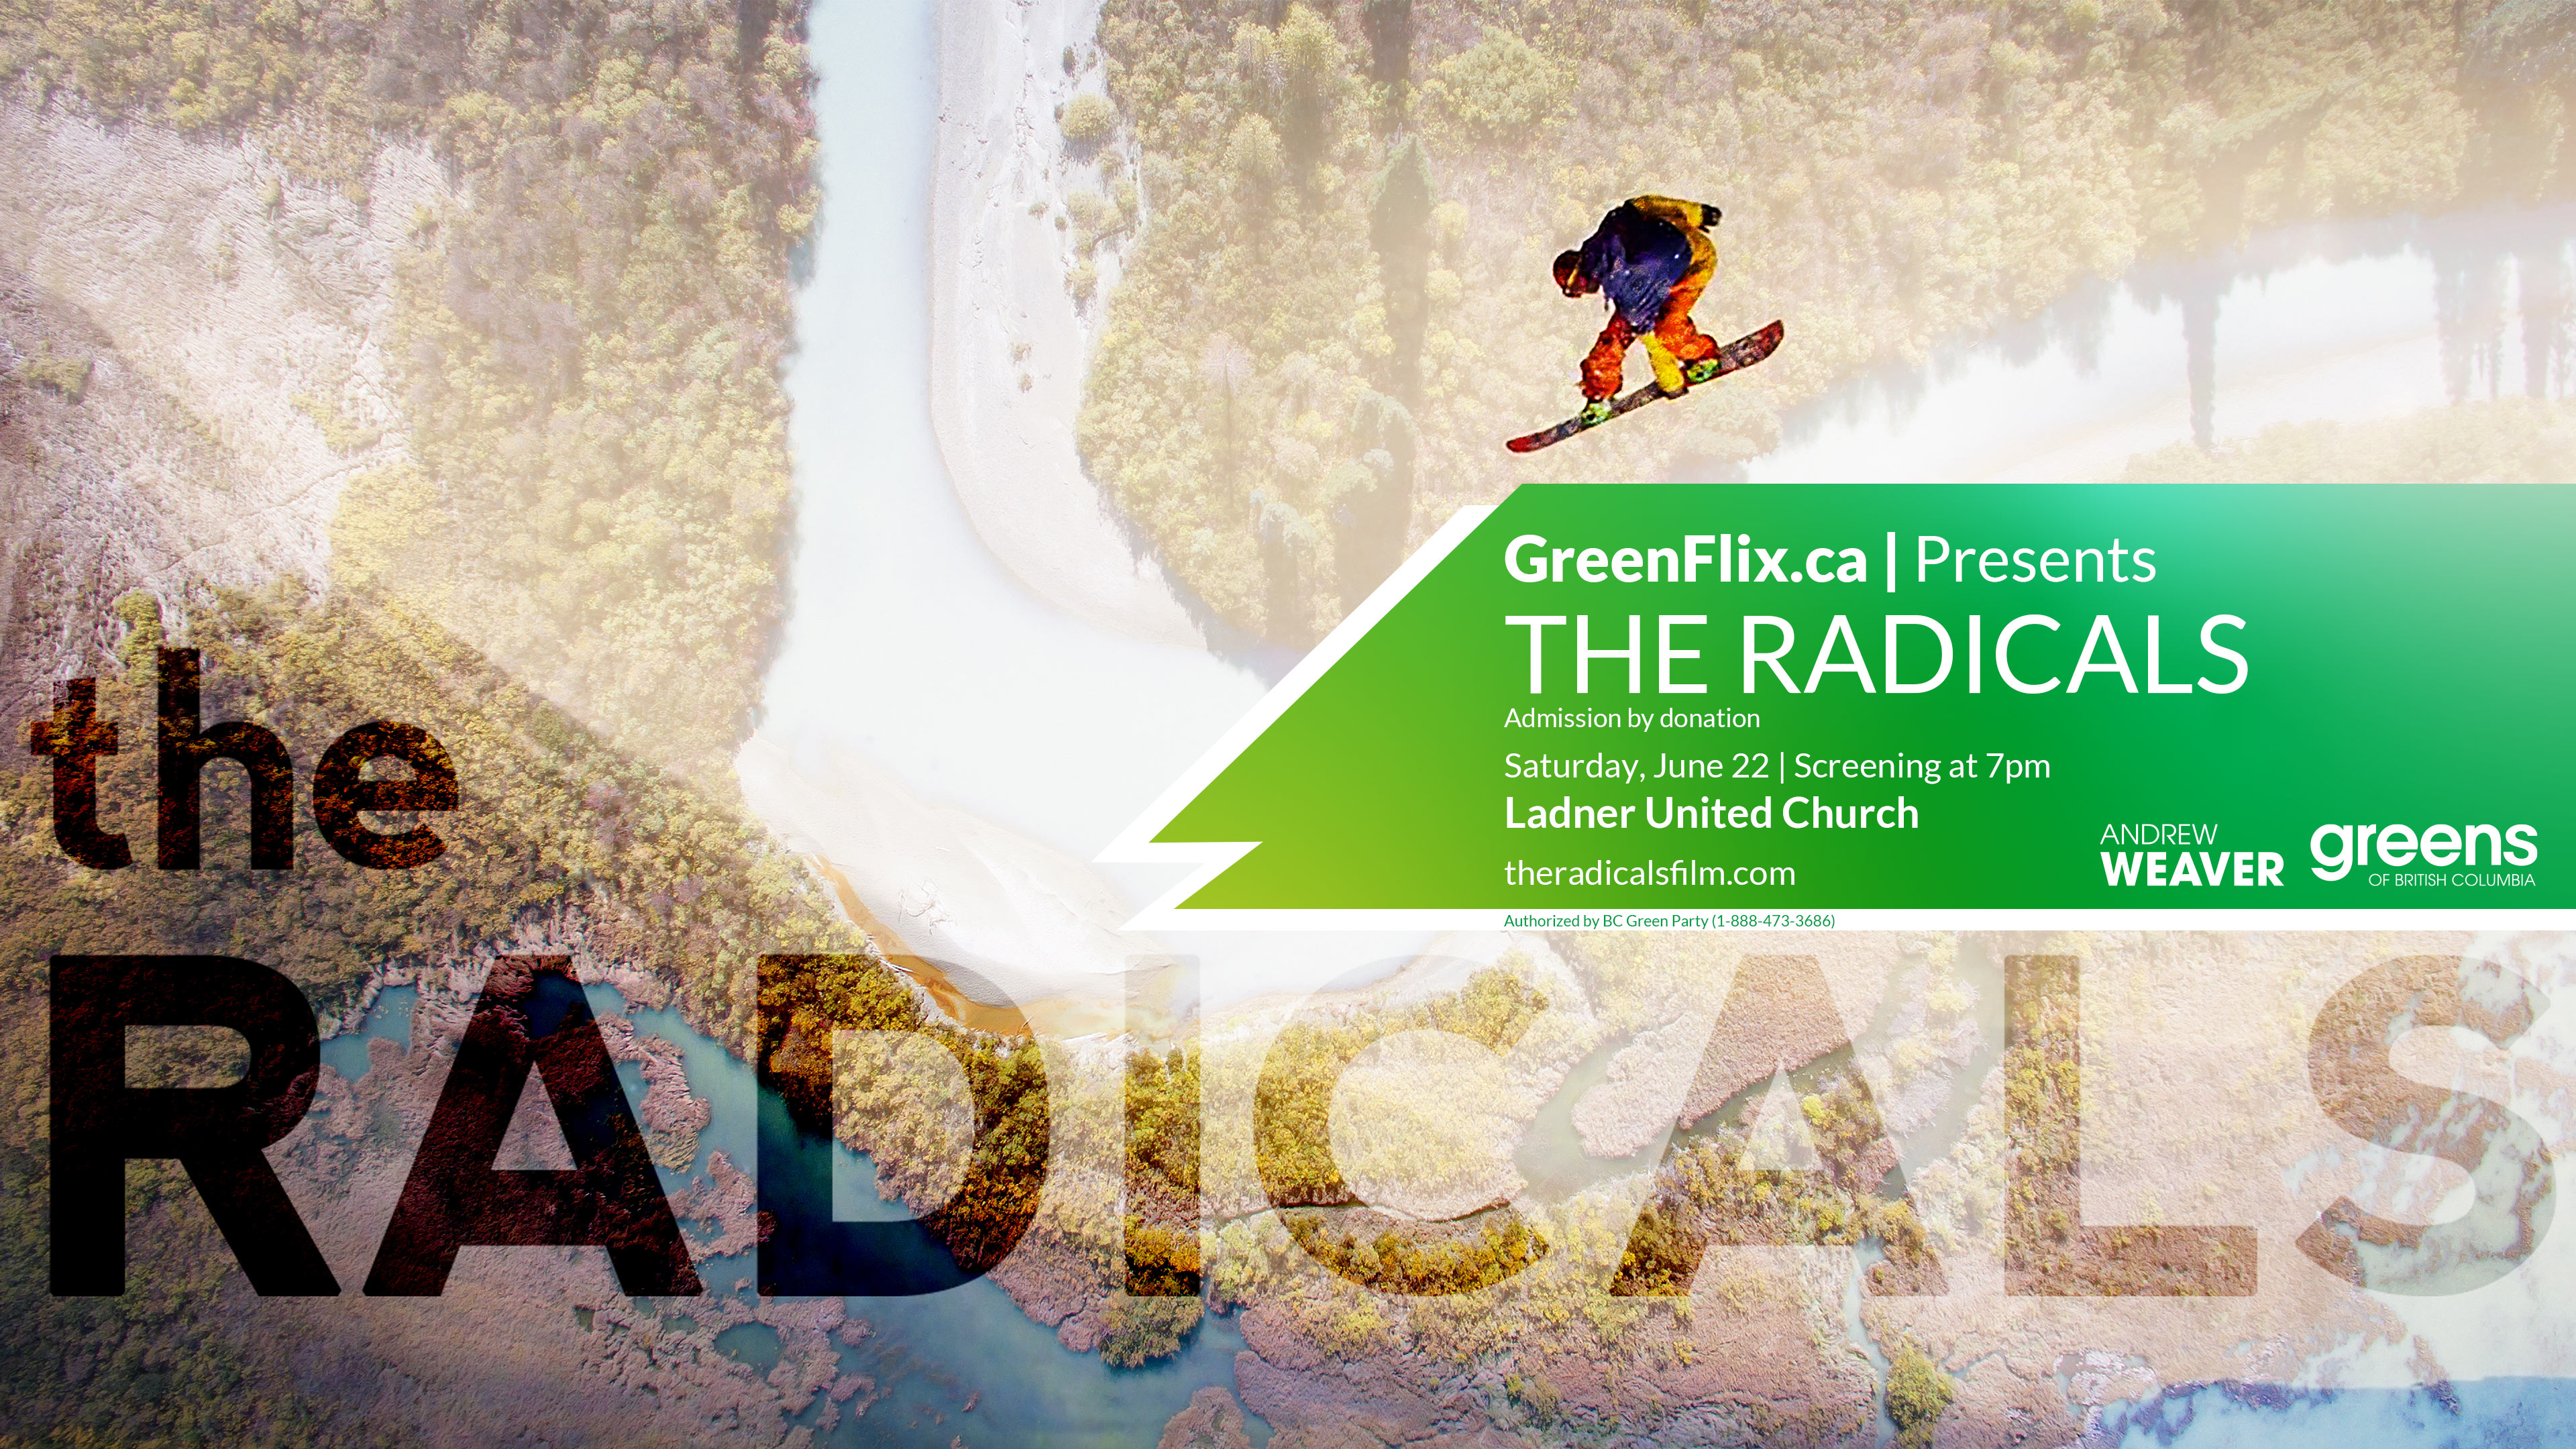 190507-Greenflix-the-Radicals_1.2.jpg